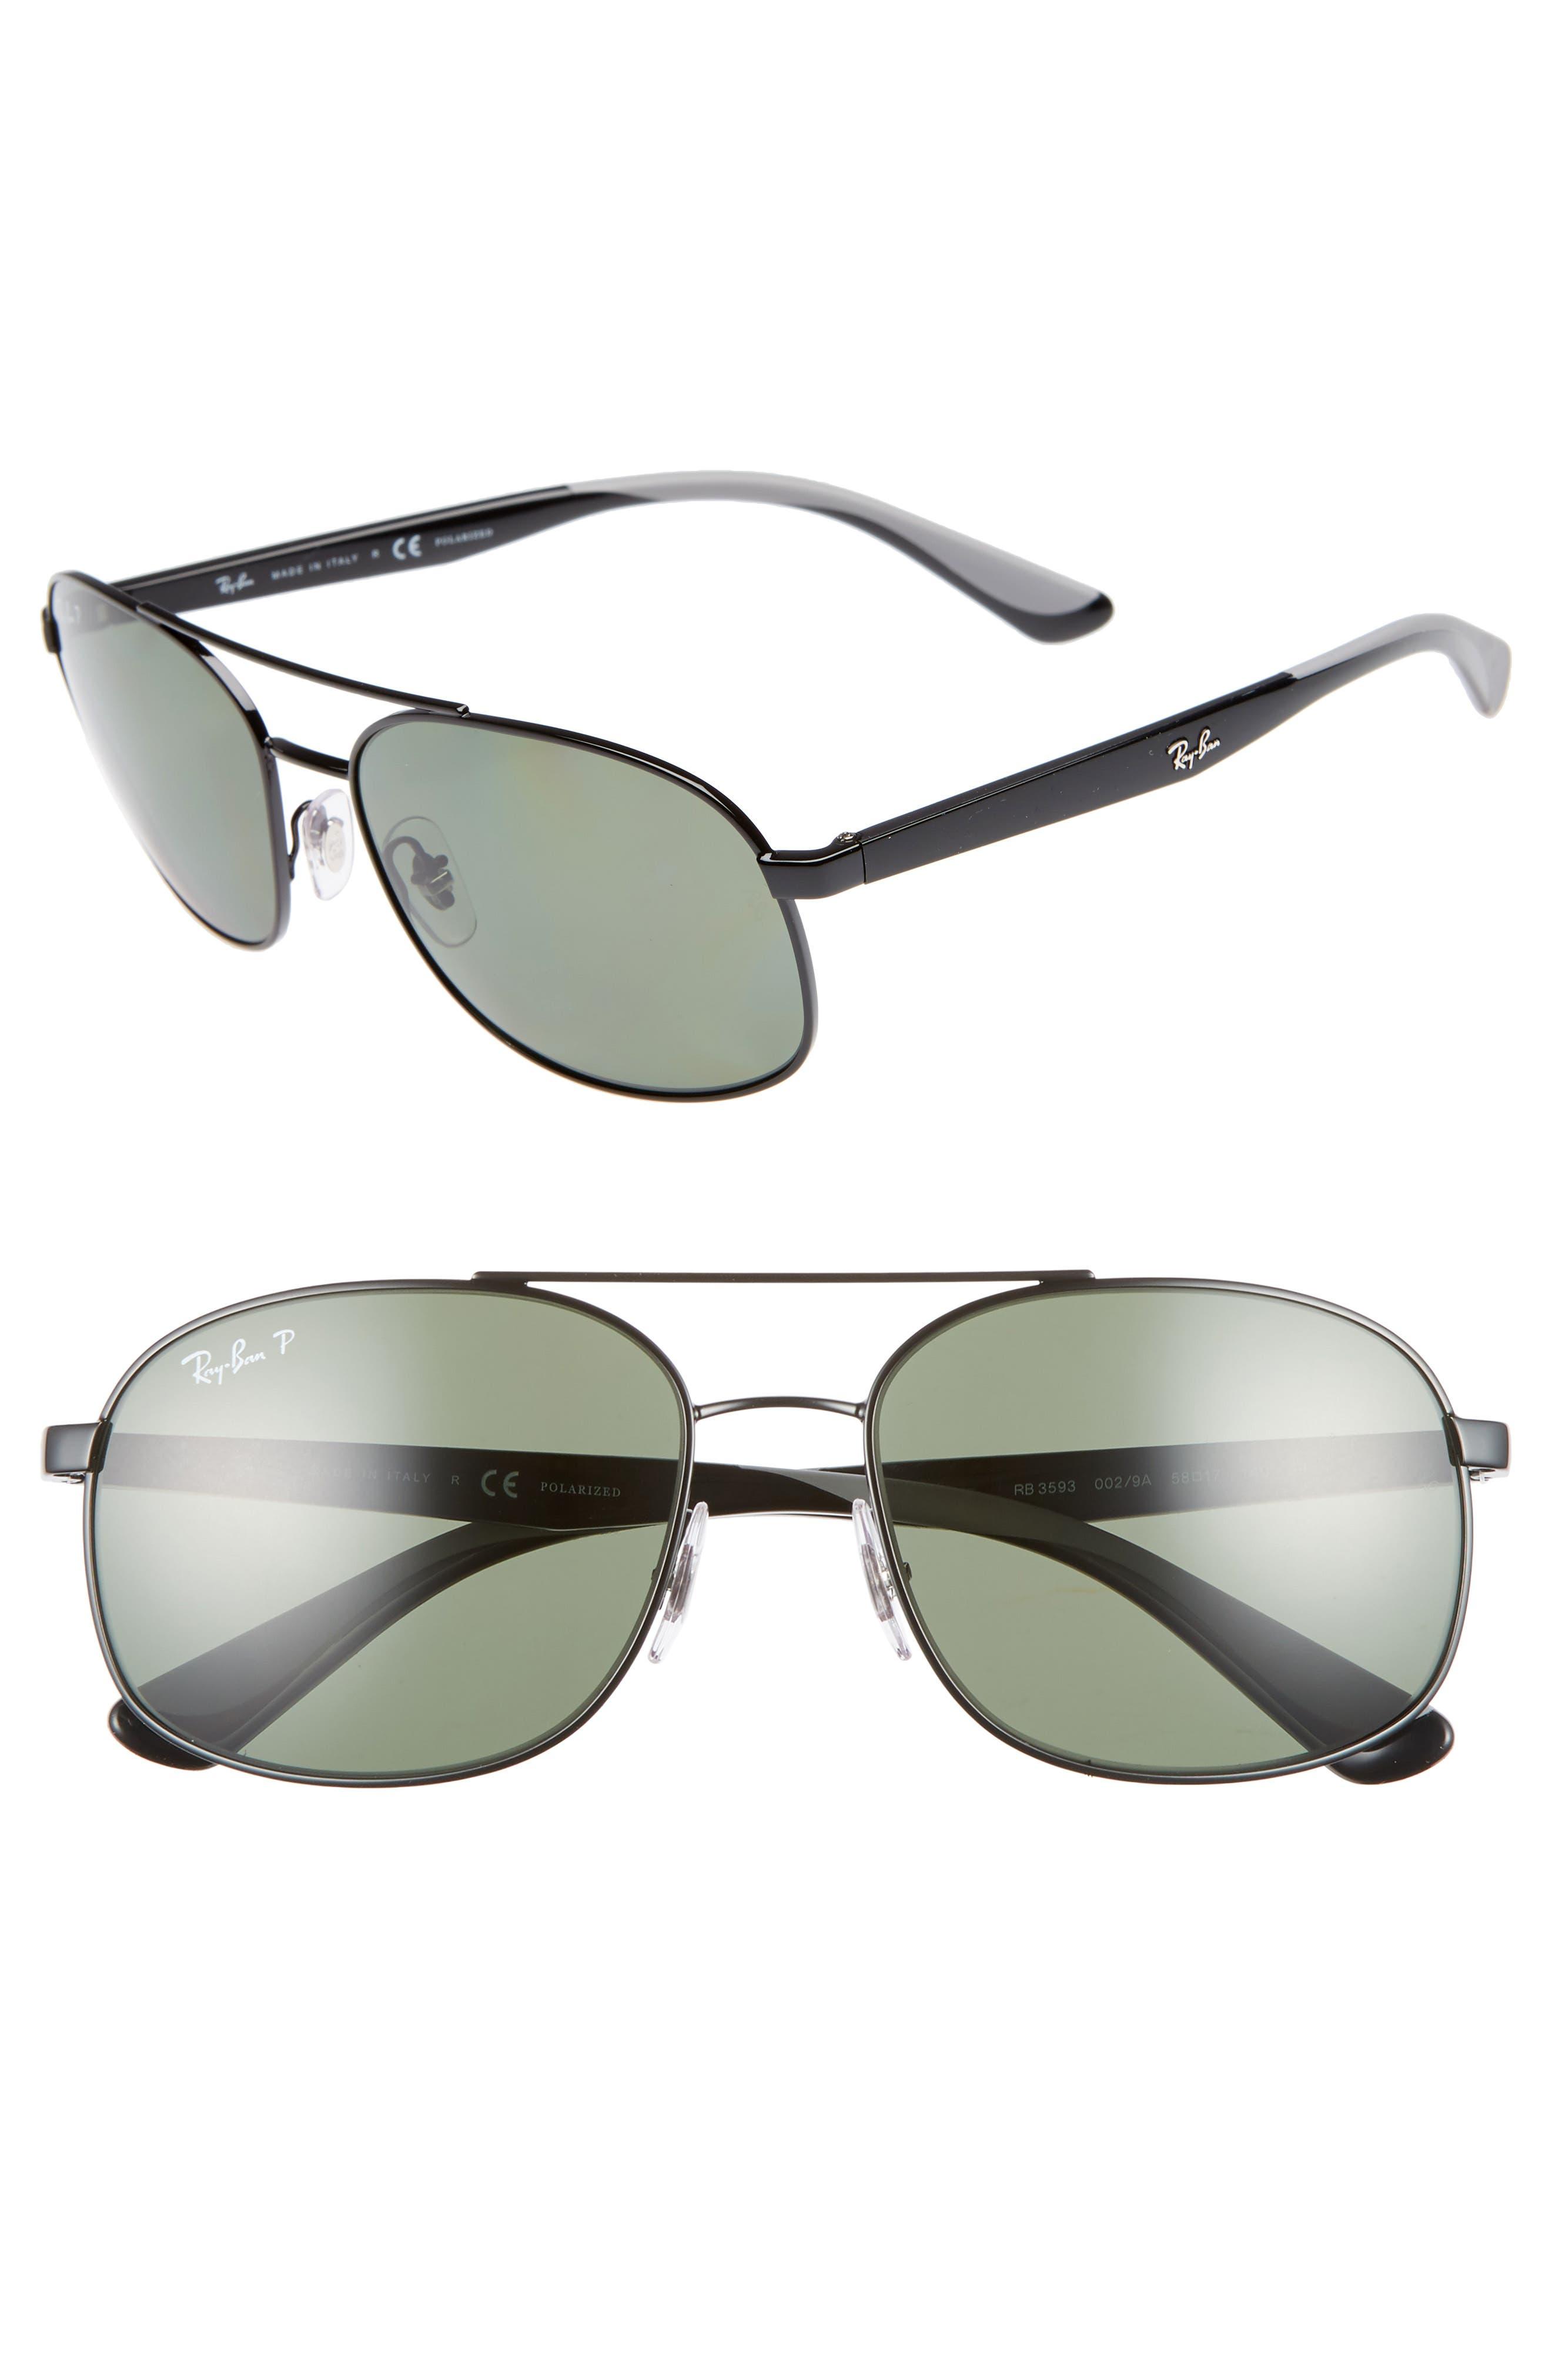 Ray-Ban 5m Navigator Sunglasses - Black